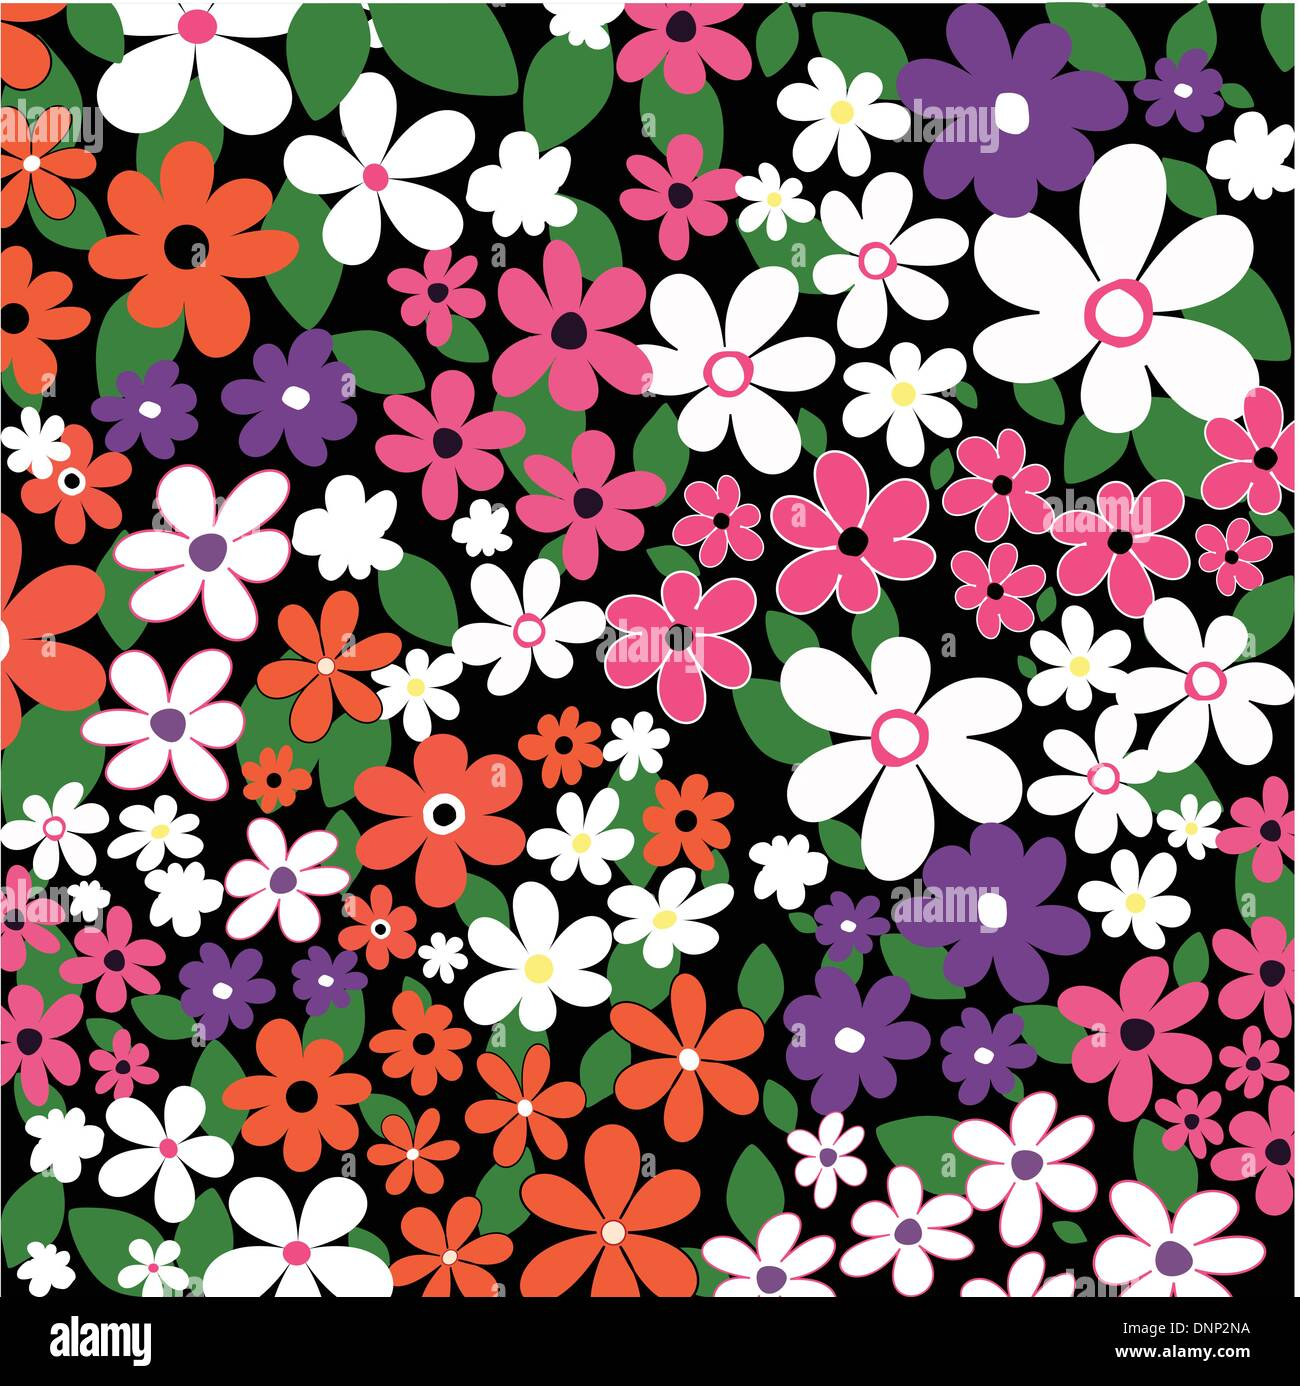 Background of many flowers - Stock Image